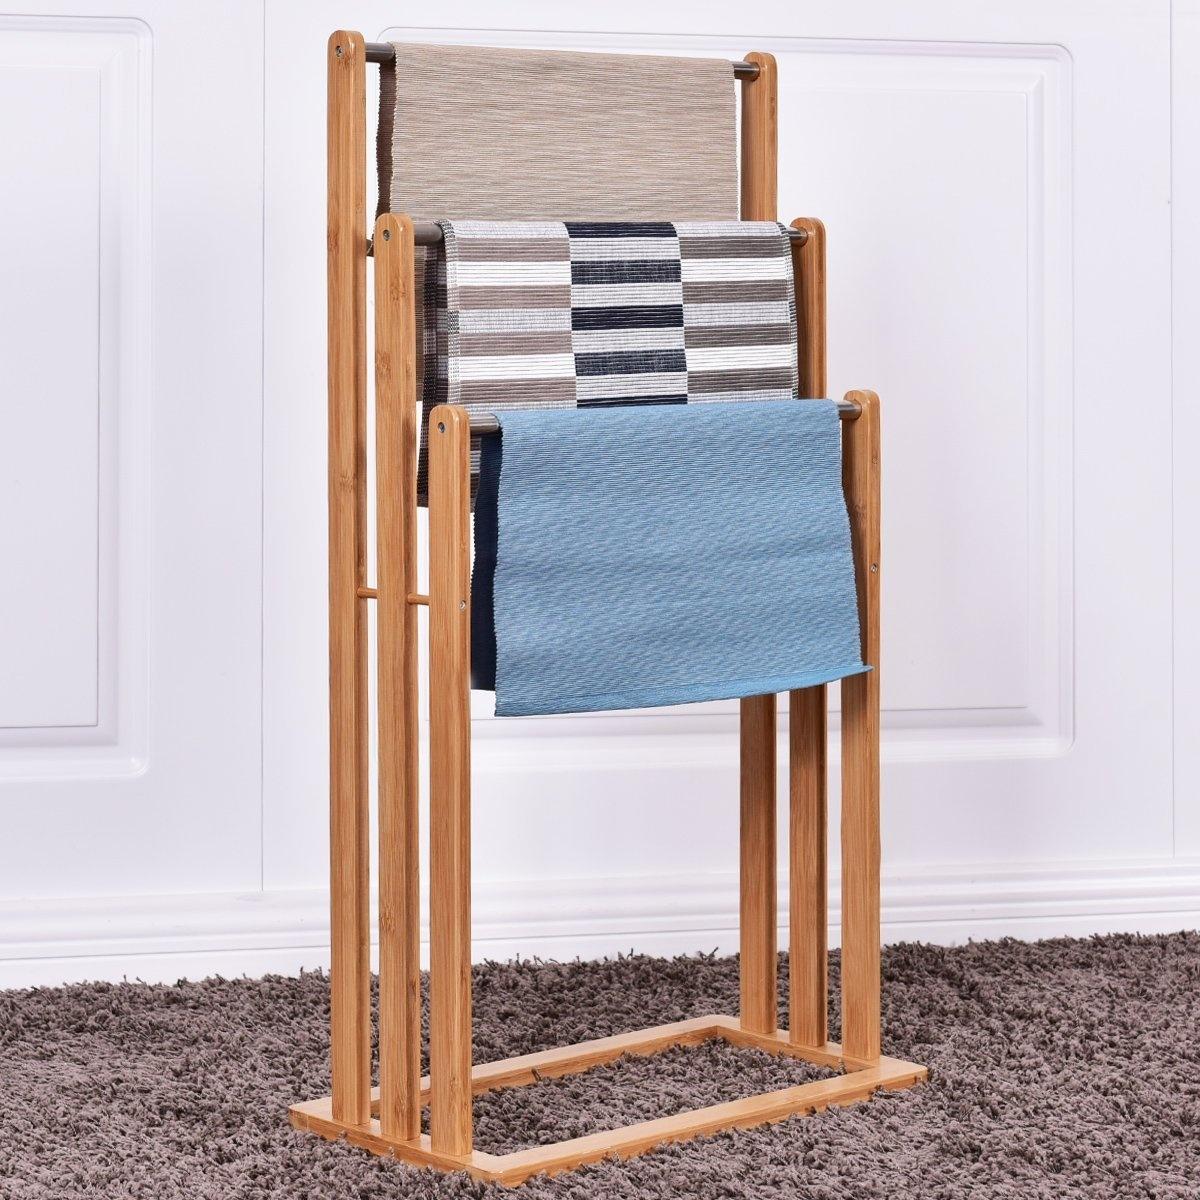 Costway 3 Tier Bamboo Towel Rack Freestanding Rail Holder Shelf ...